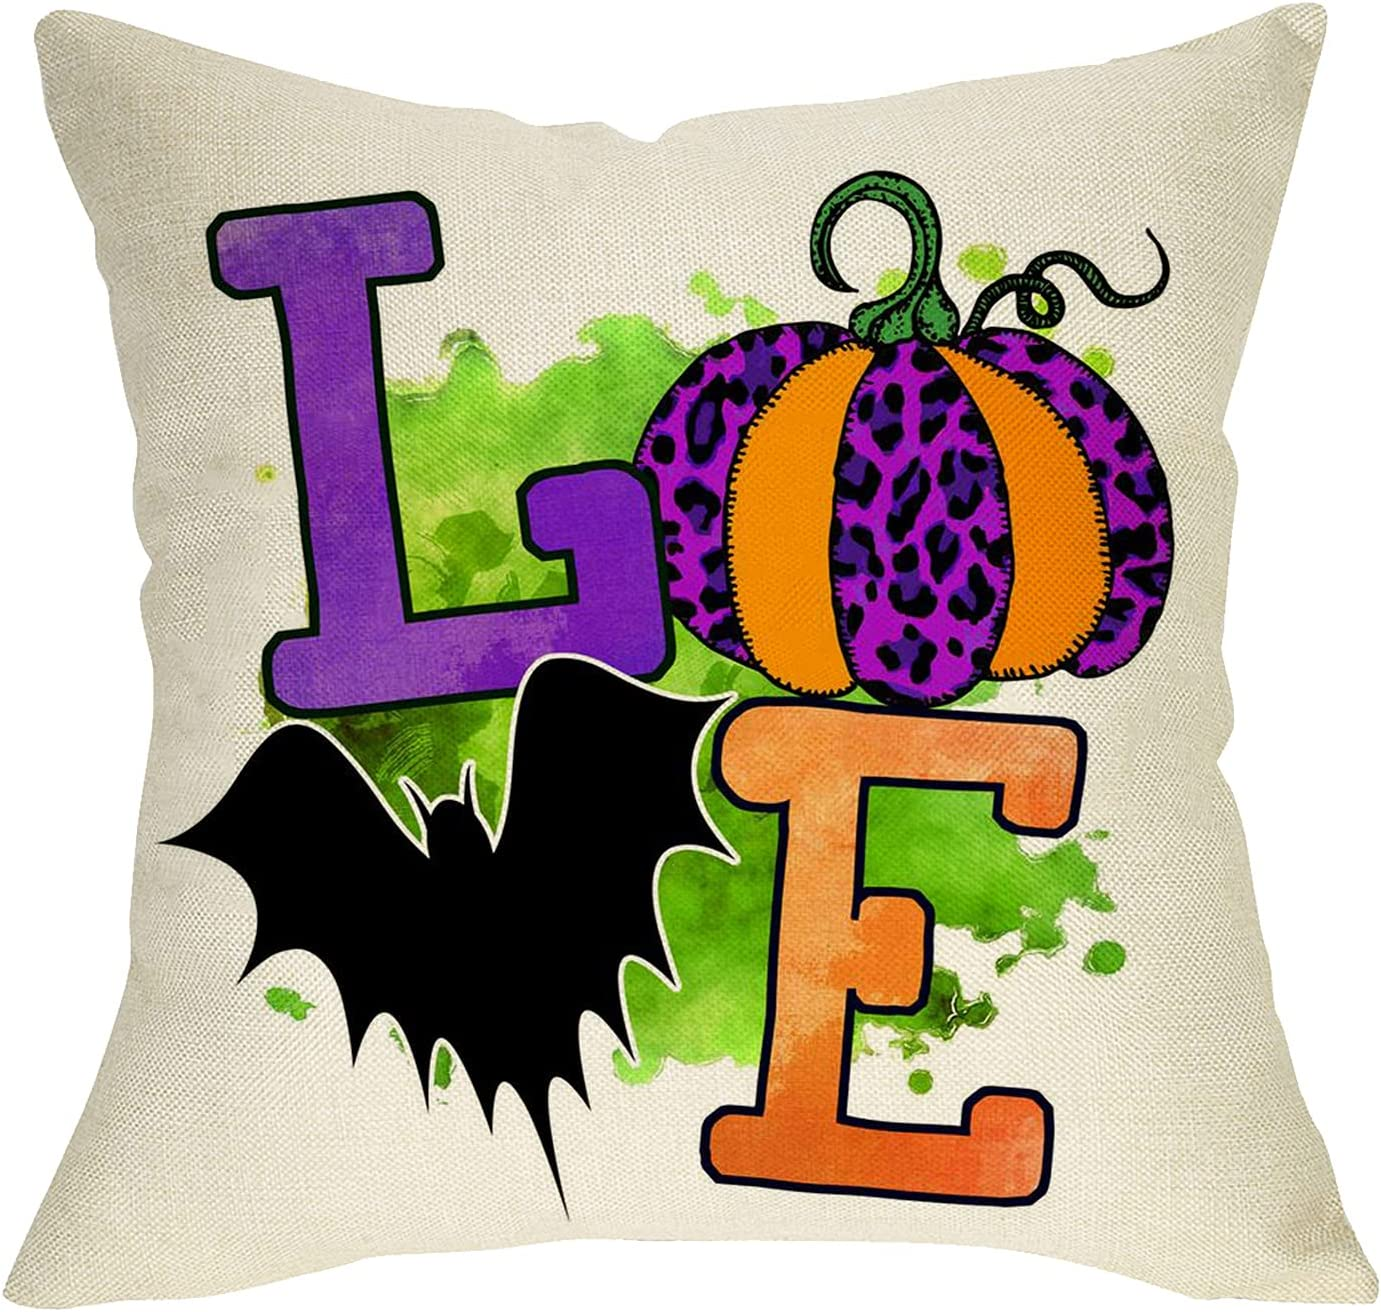 Softxpp Love Decorative Halloween Throw Pillow Cover, Leopard Pumpkin Bat Cushion Case Fall Autumn Home Decoration, Purple Orange Square Pillowcase Seasonal Decor for Sofa Couch 18 x 18 Cotton Linen